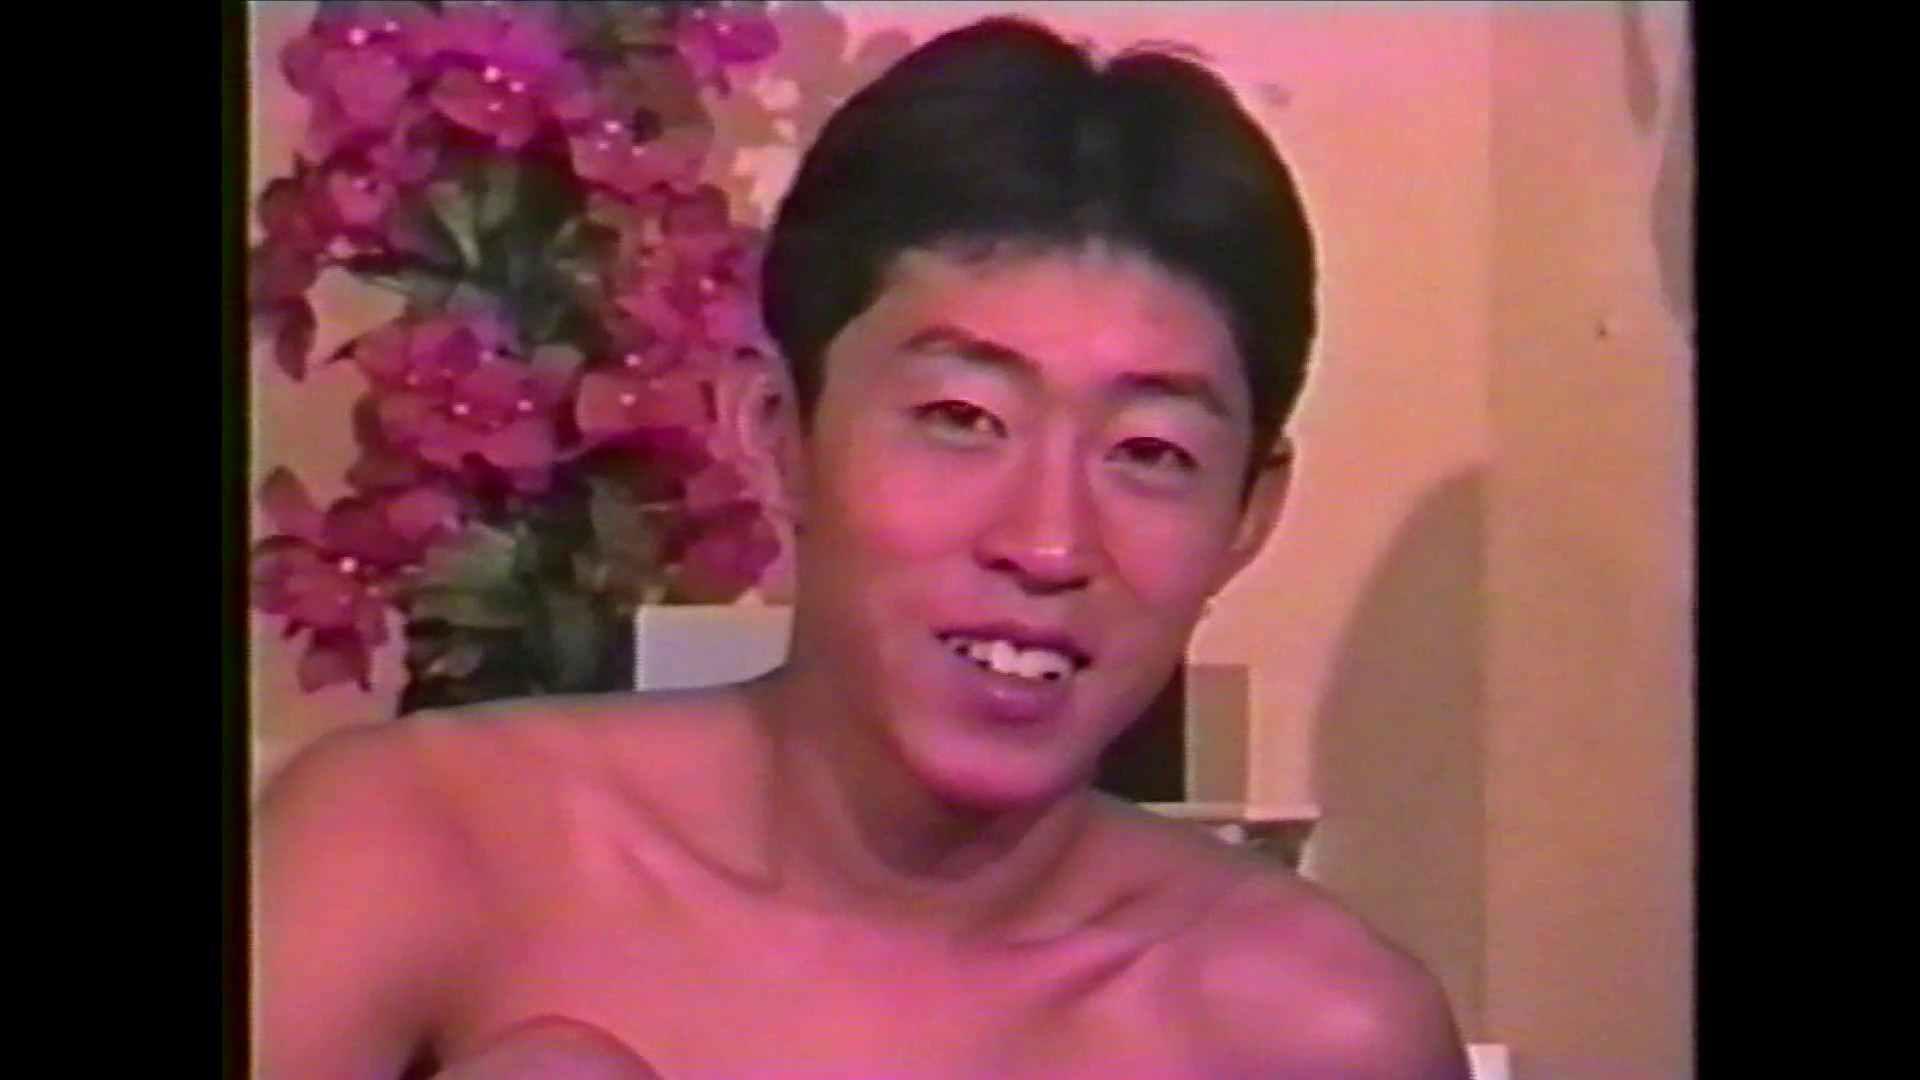 GAYBOY宏のオカズ倉庫Vol.12-2 ノンケ達のセックス | 完全無修正  94画像 13